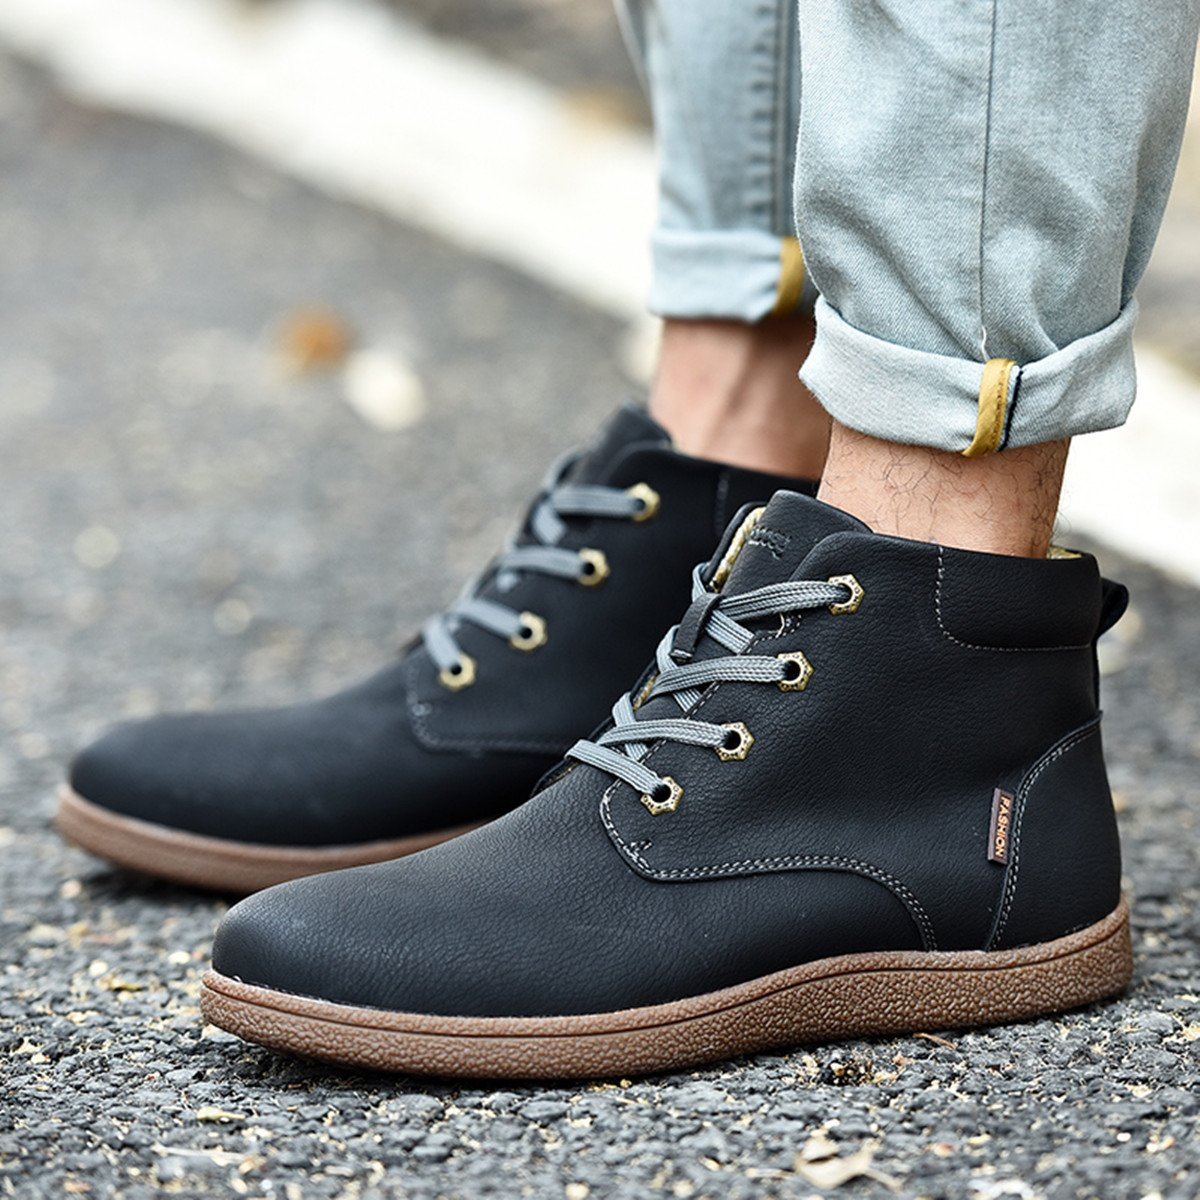 8af4381ffdd Gracosy Chaussure de Ville Homme